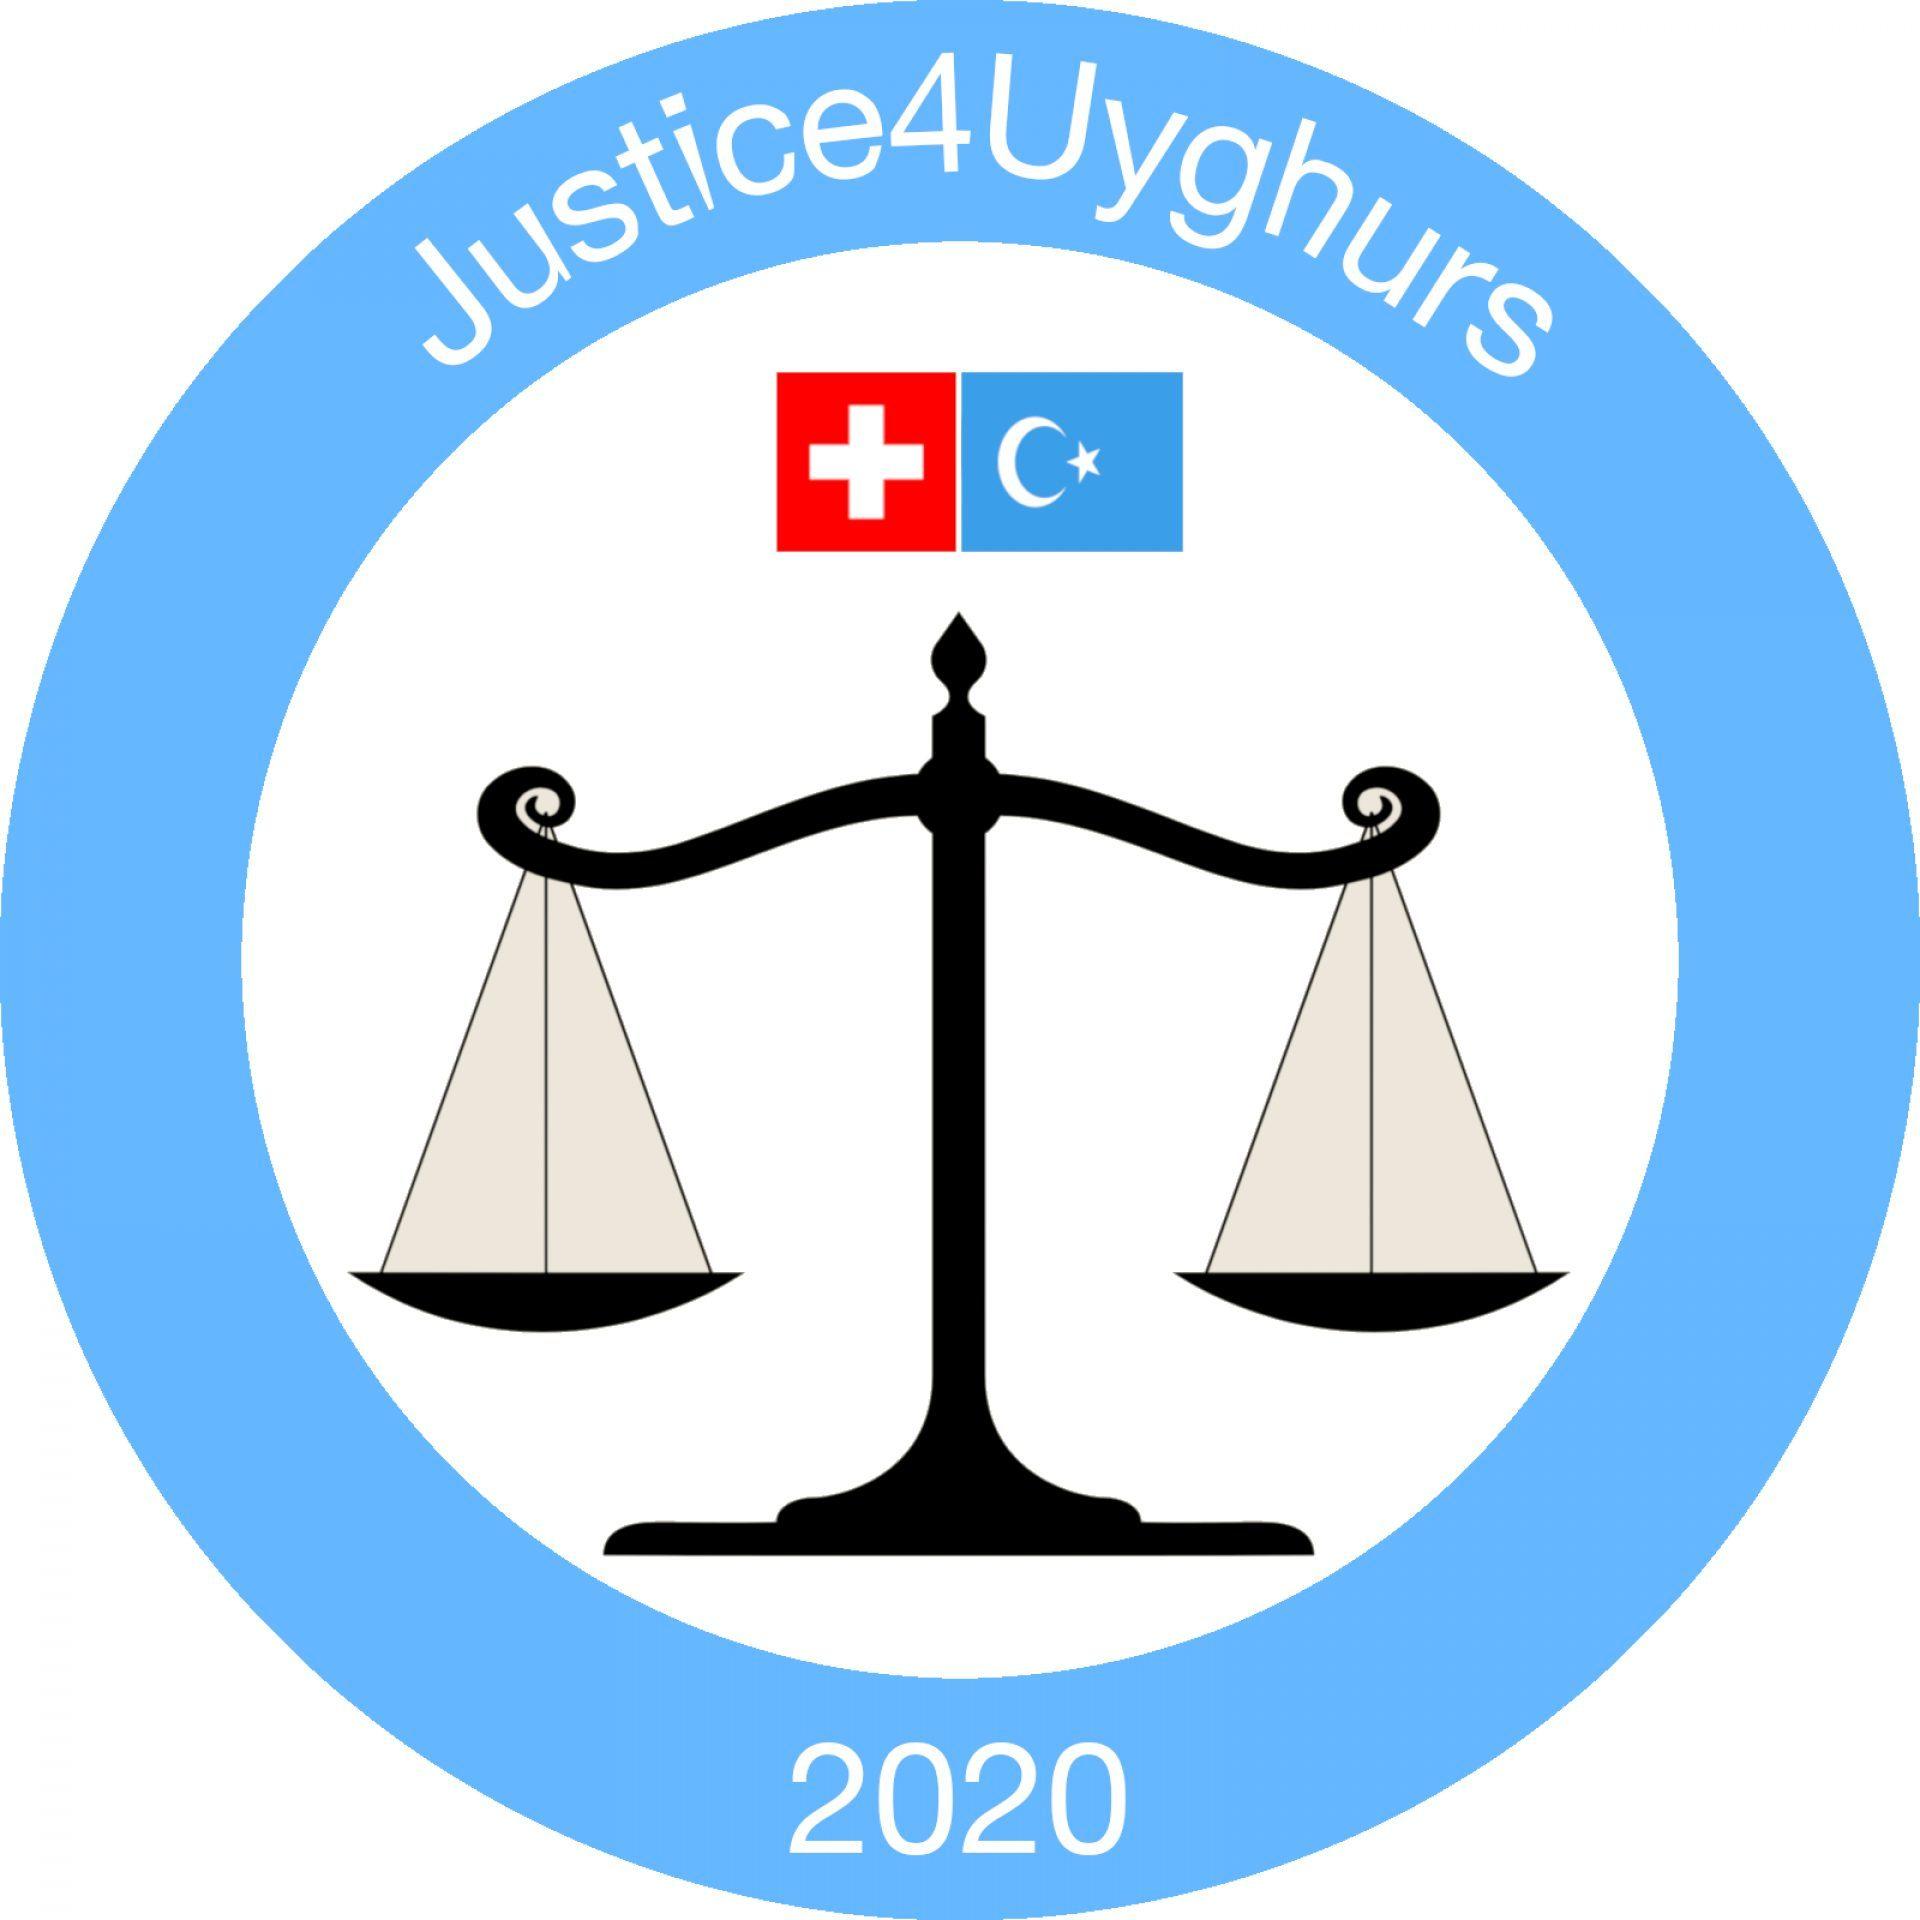 Justice for Uyghurs